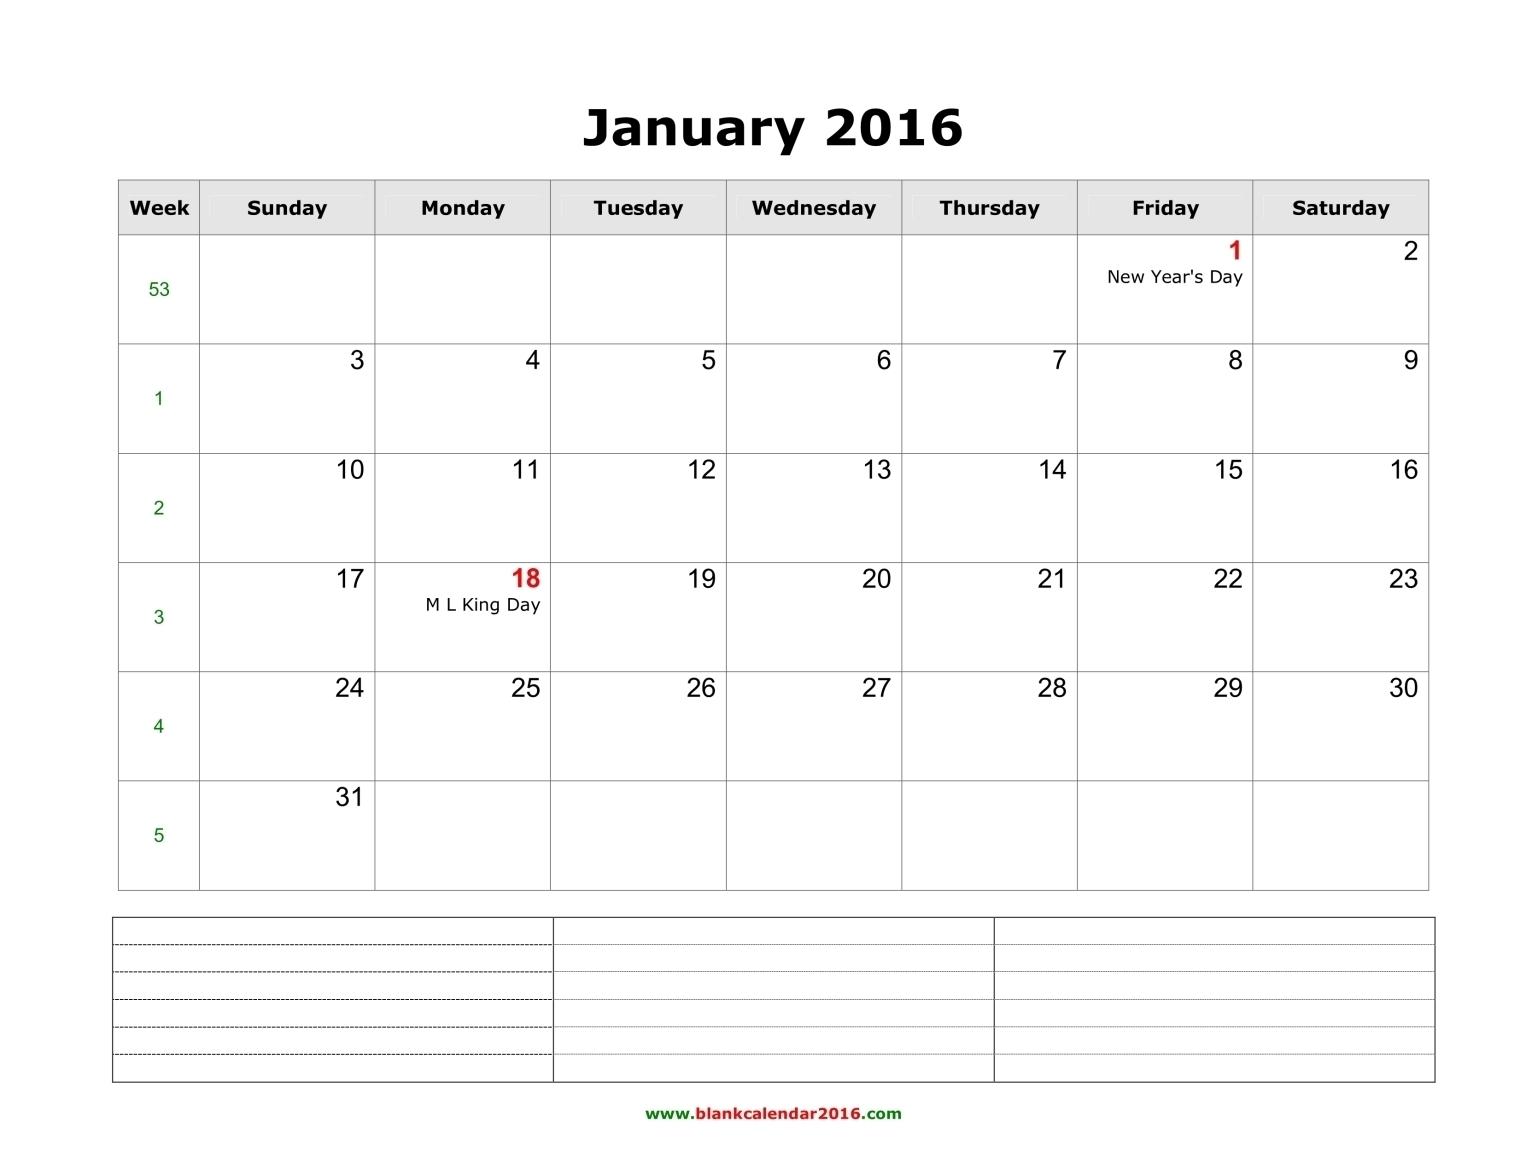 Monthly Calendar Notes | Week Printable Calendar intended for Blank 3 Month Printable Monthly Calendar